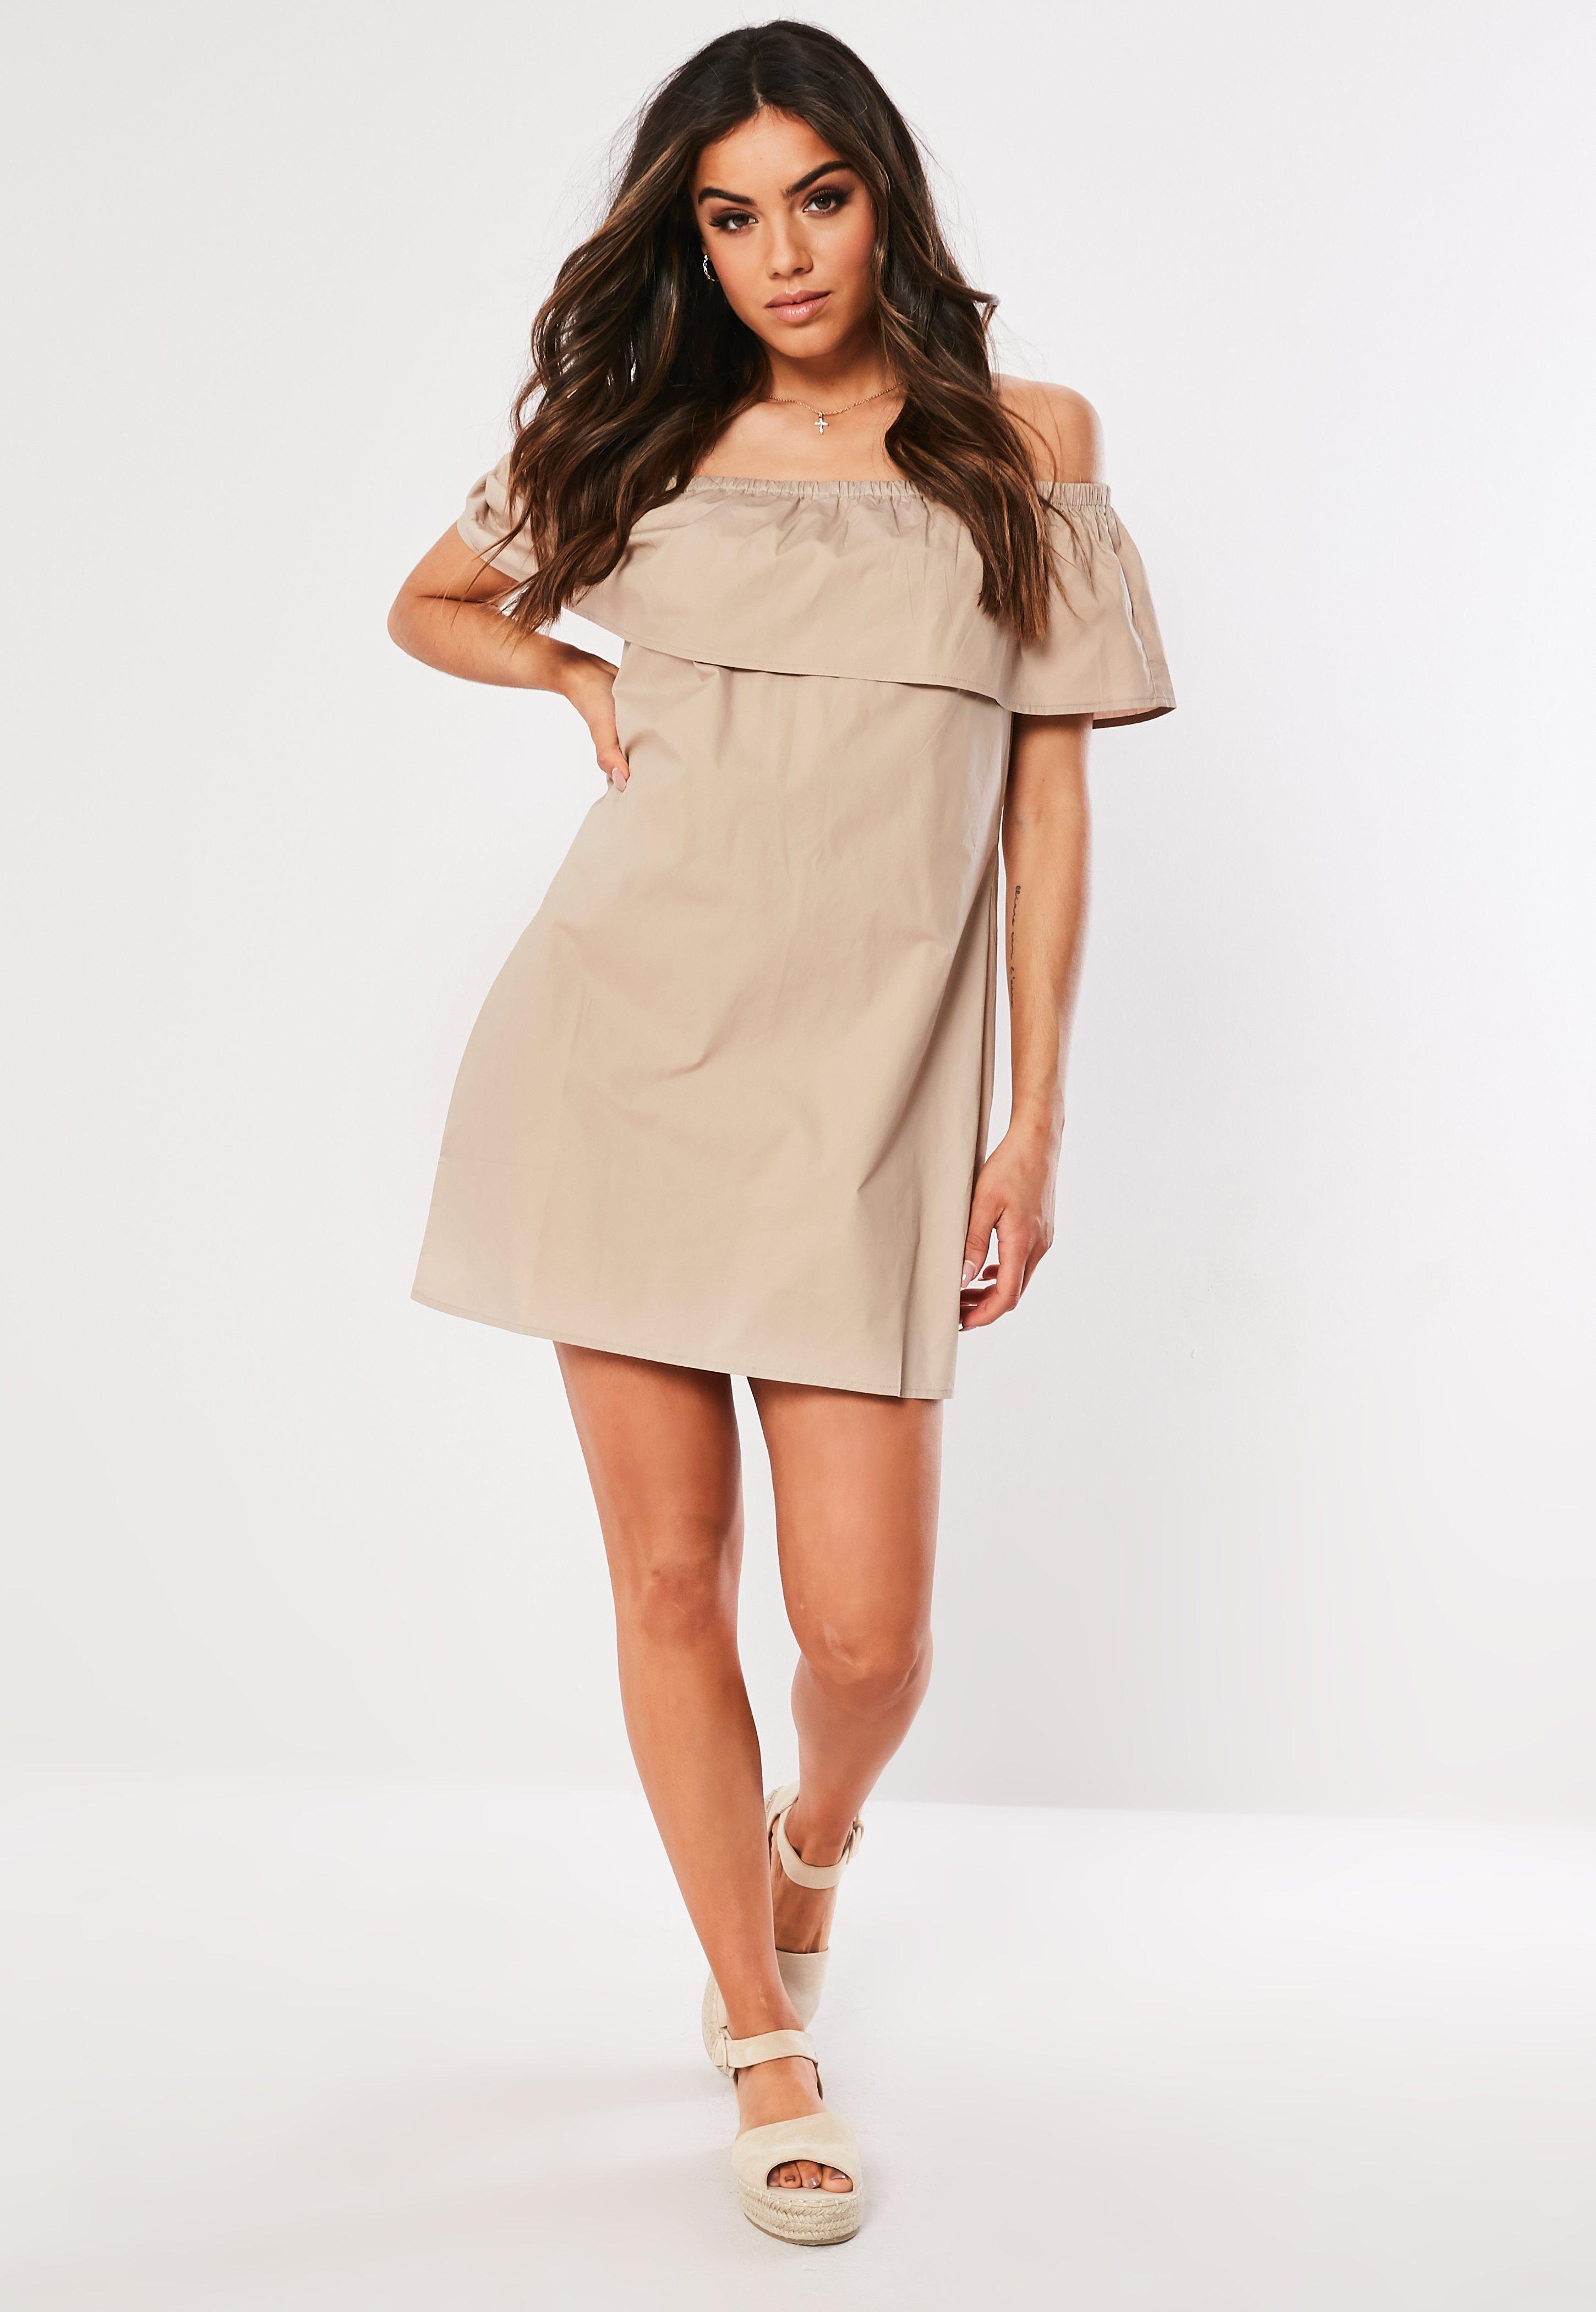 8e785938d80b Off the Shoulder Dresses - Bardot Dresses Online